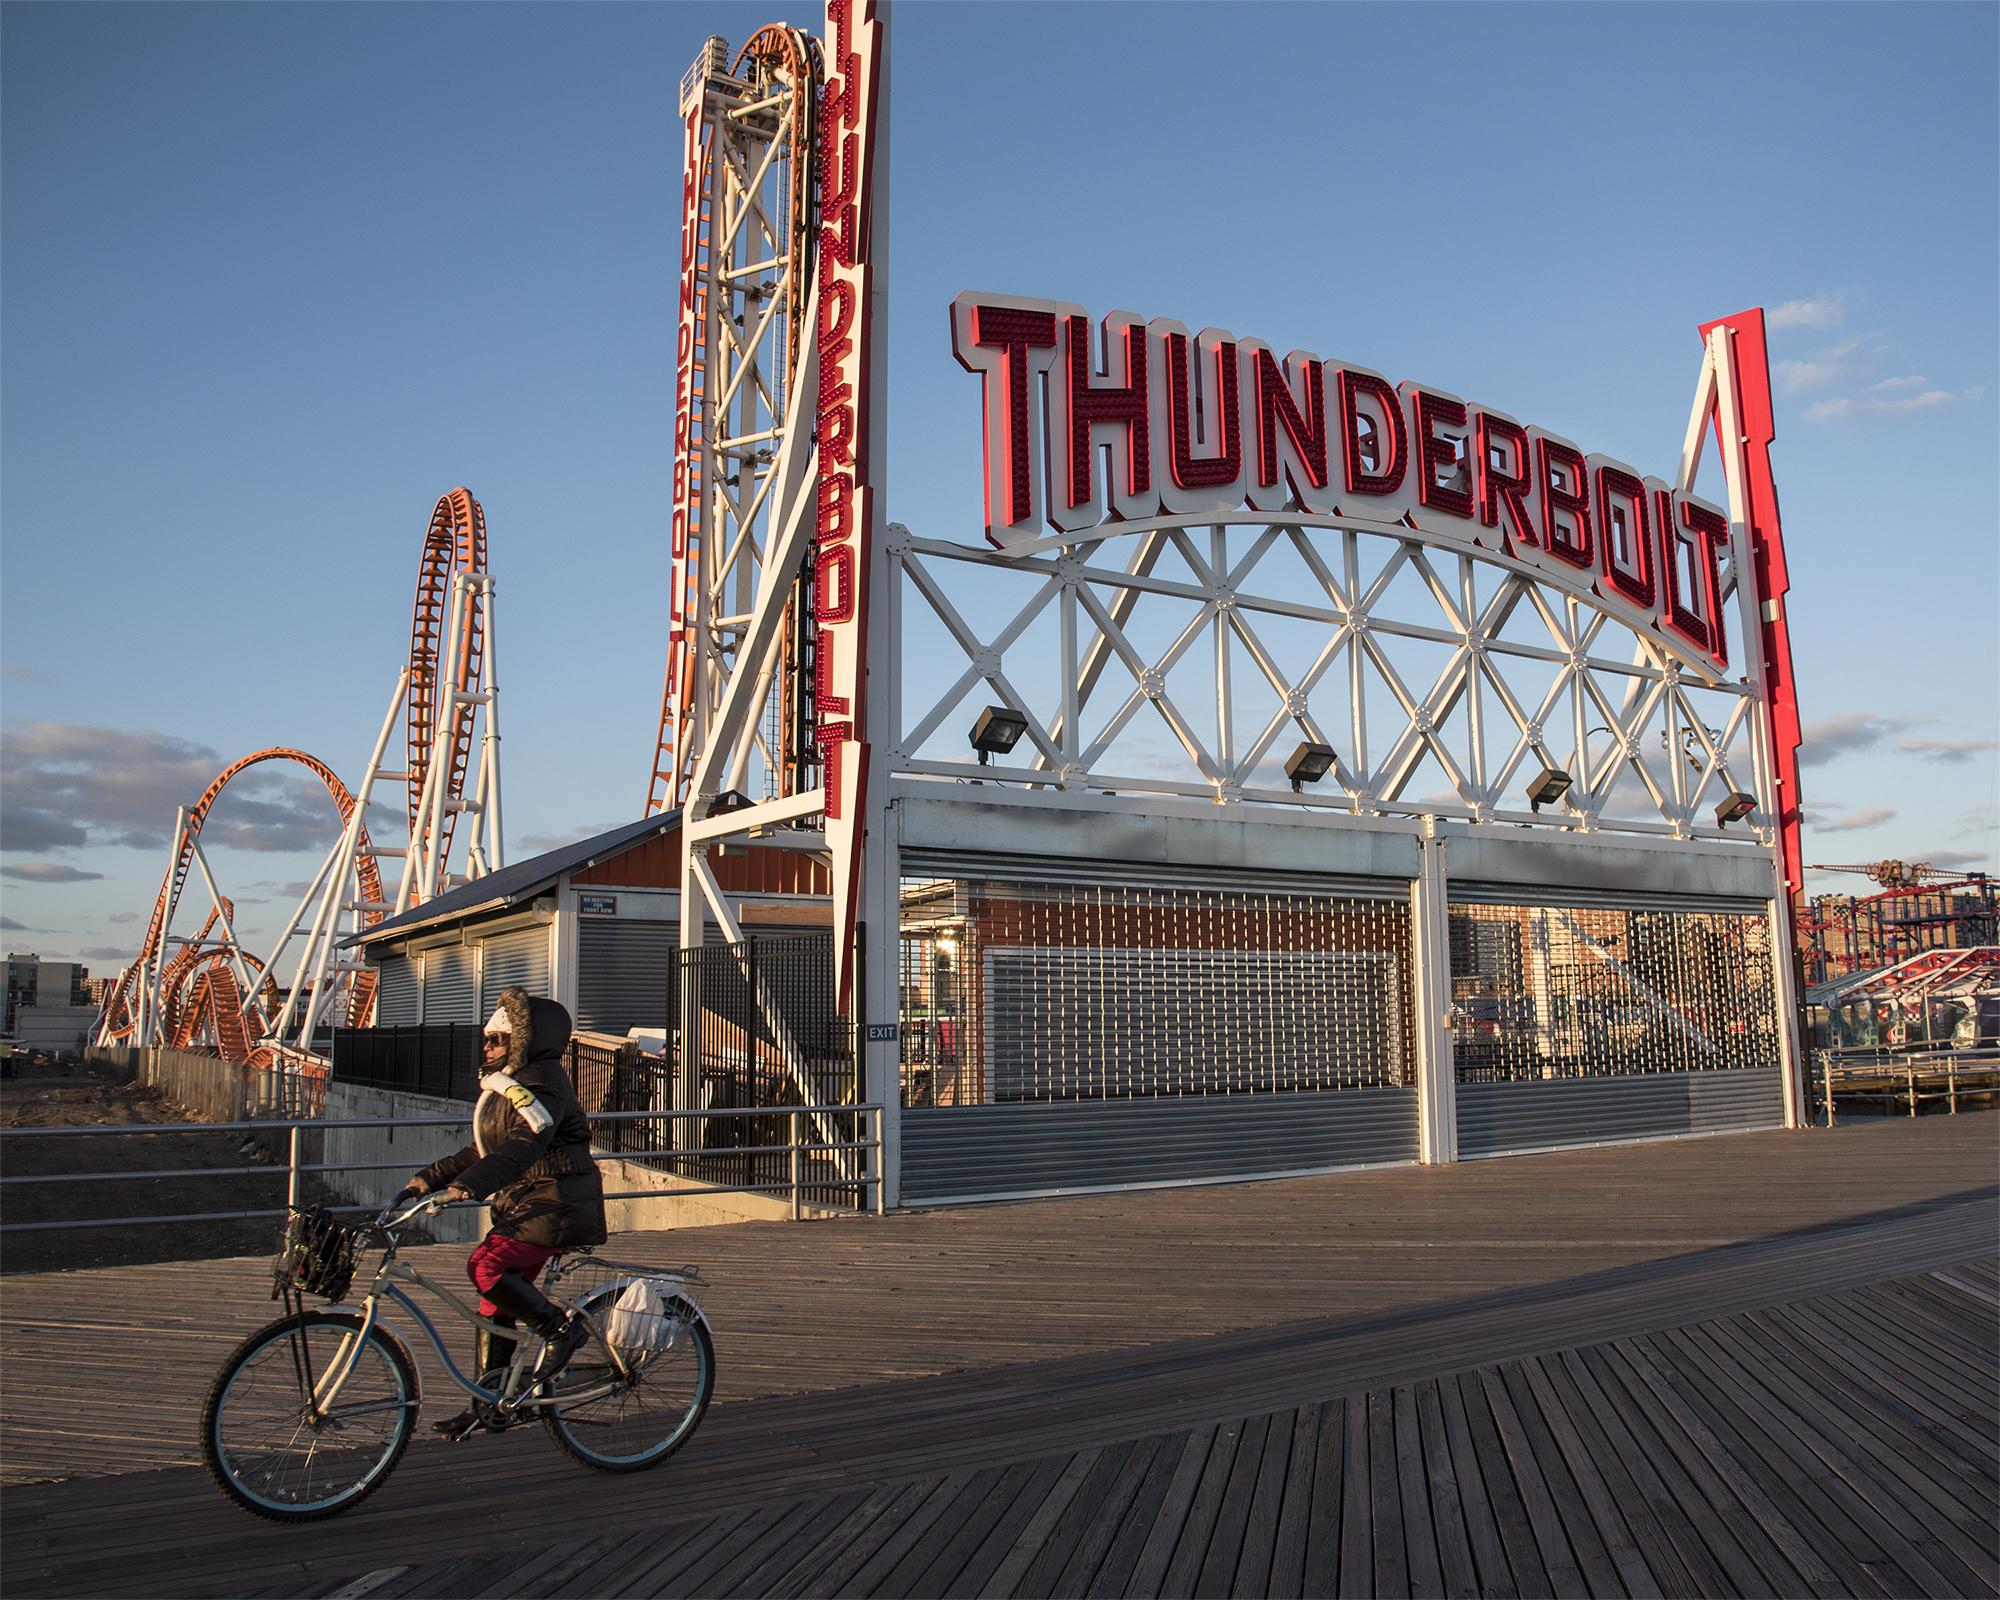 Thunderbolt_LGP_2087_WEB.jpg